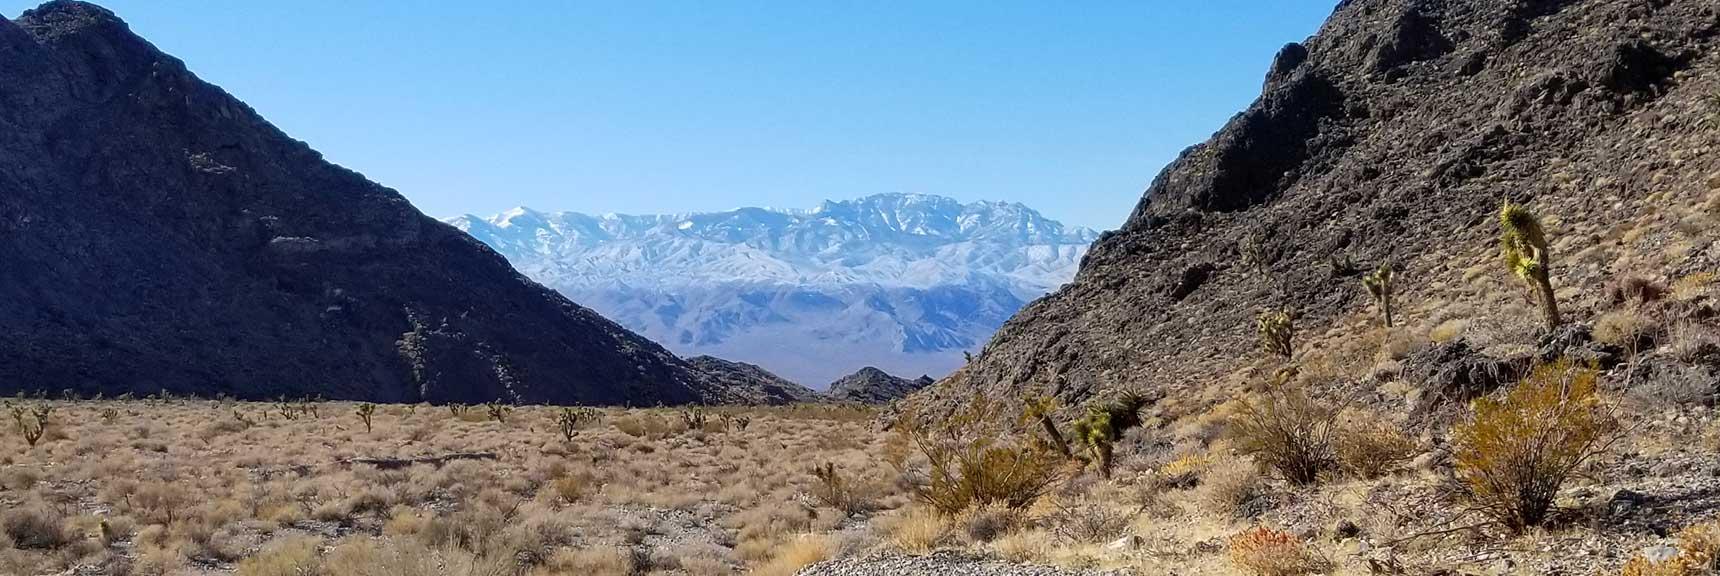 View Down the Sheep Range / Fossil Ridge Pass in the Desert National Wildlife Refuge, Nevada